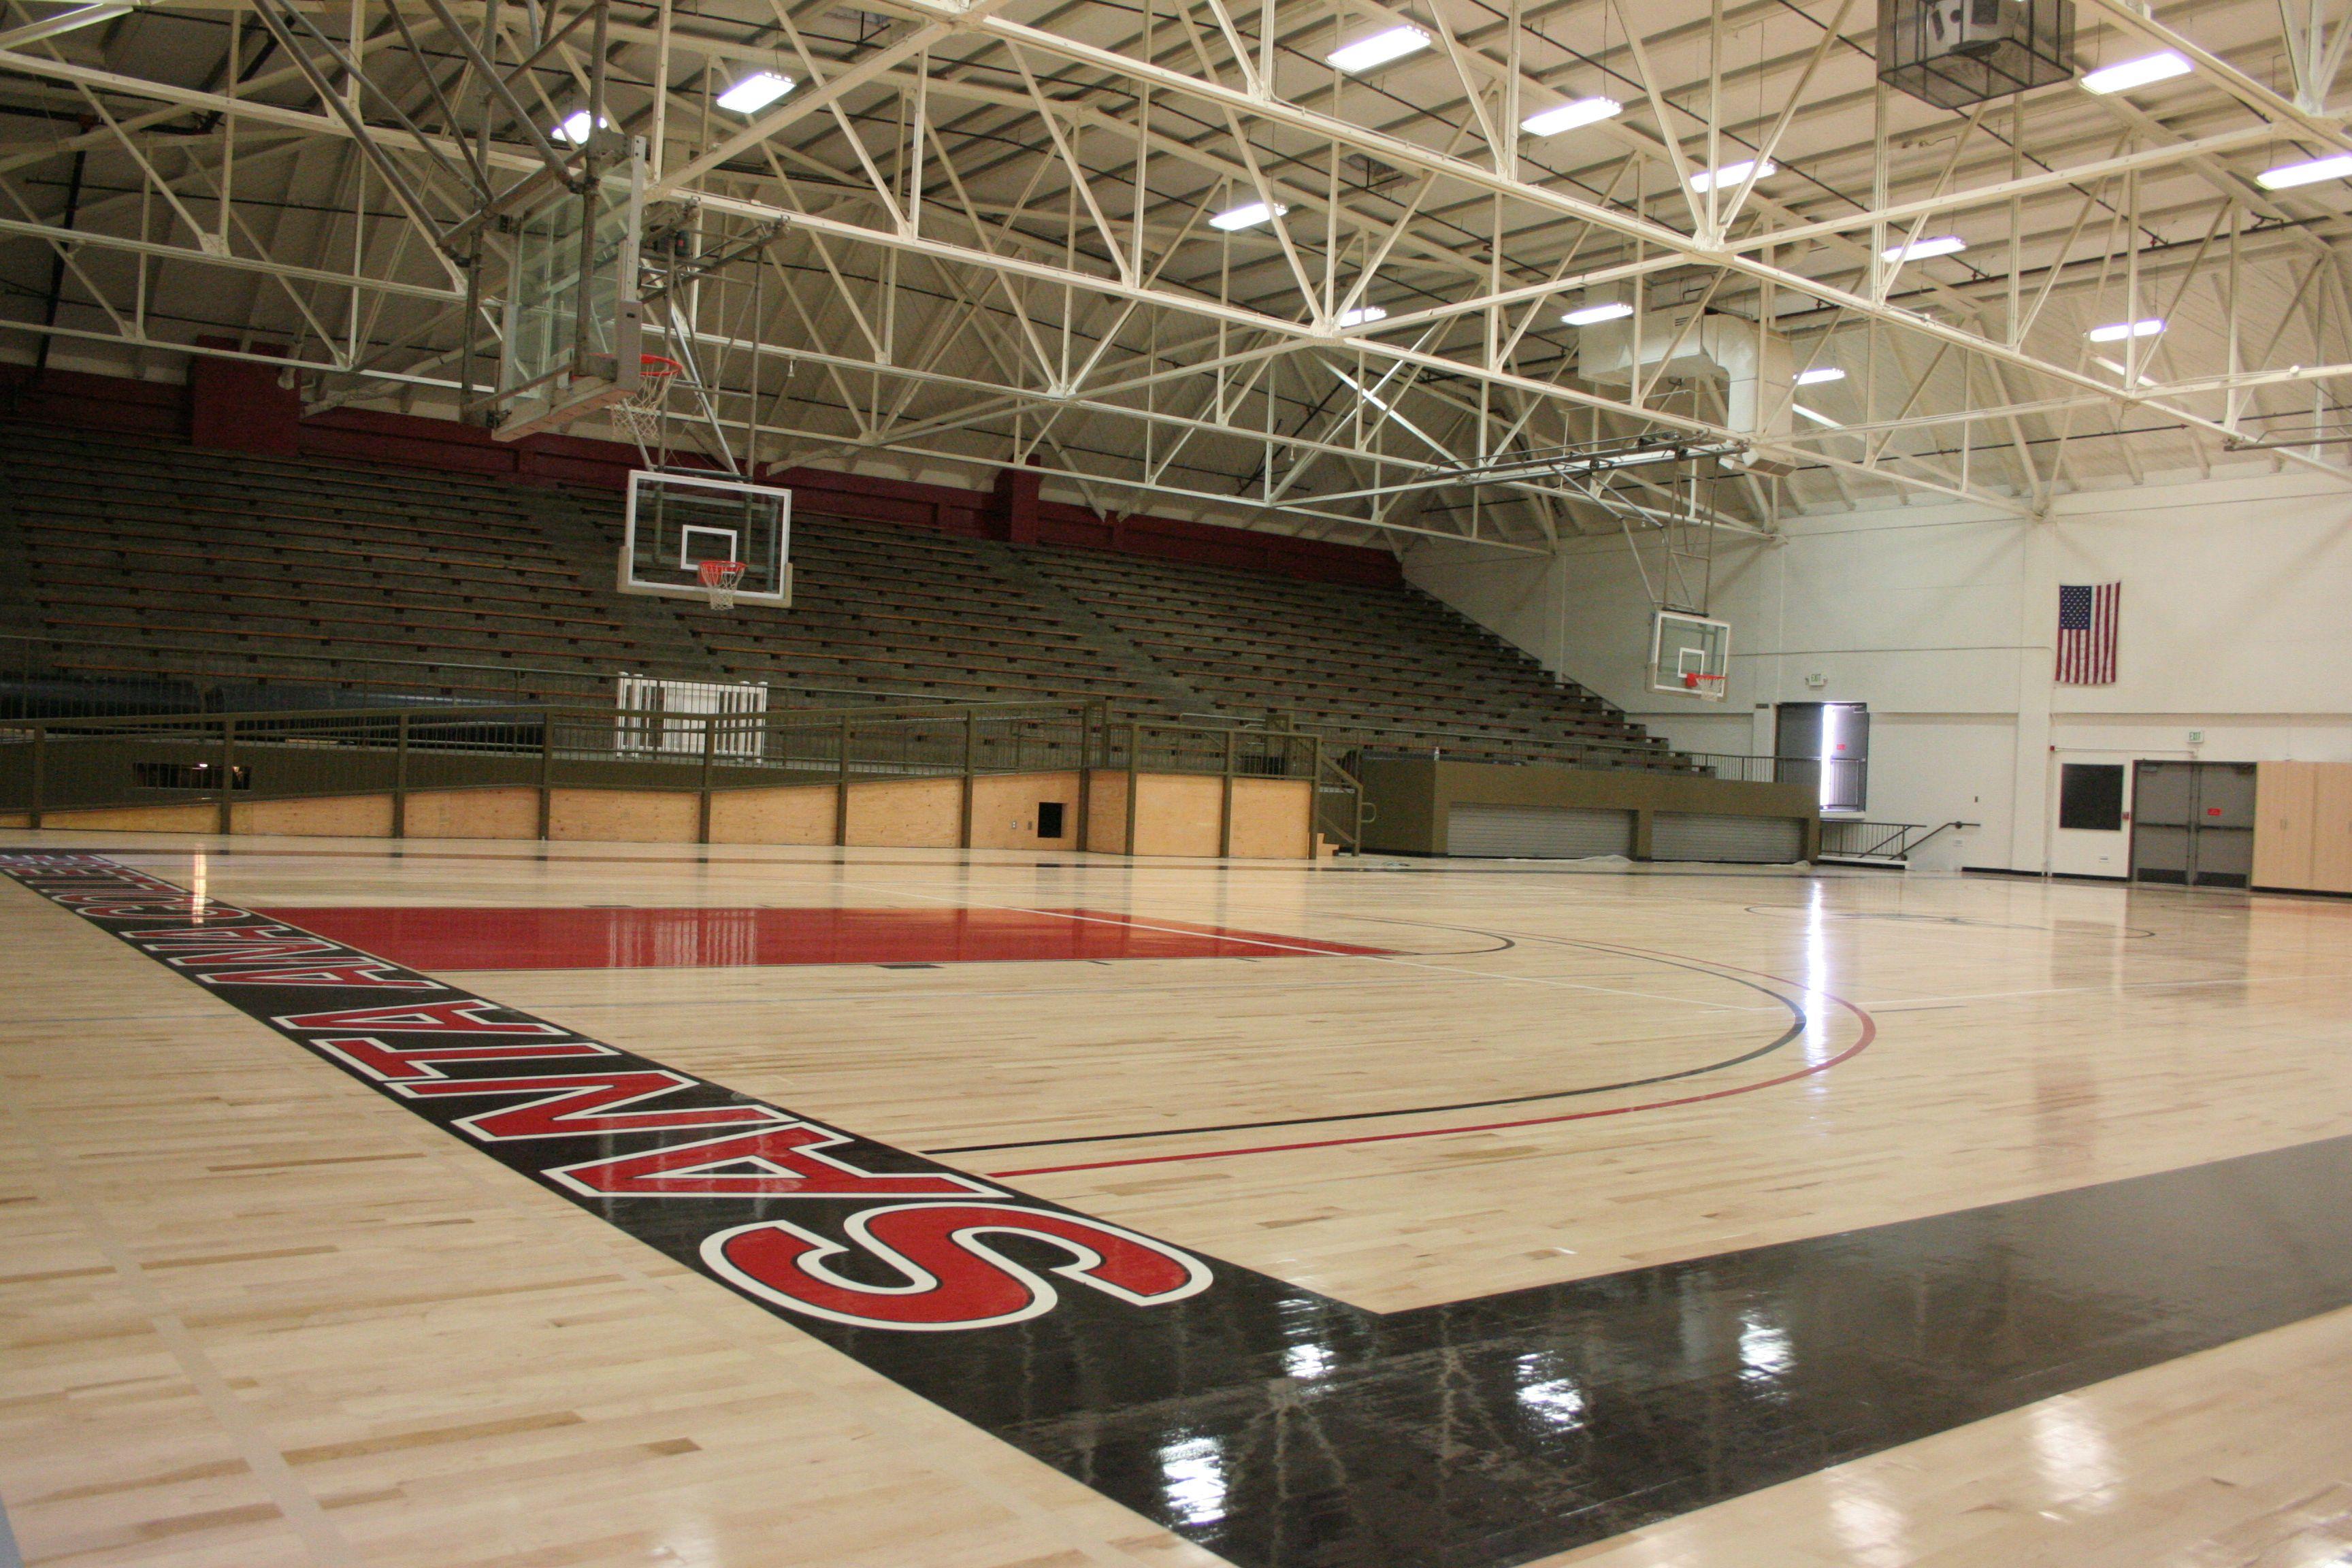 6f317ddbda262d40805179d167b58f13 - Hawaiian Gardens Civic Center Basketball Gym